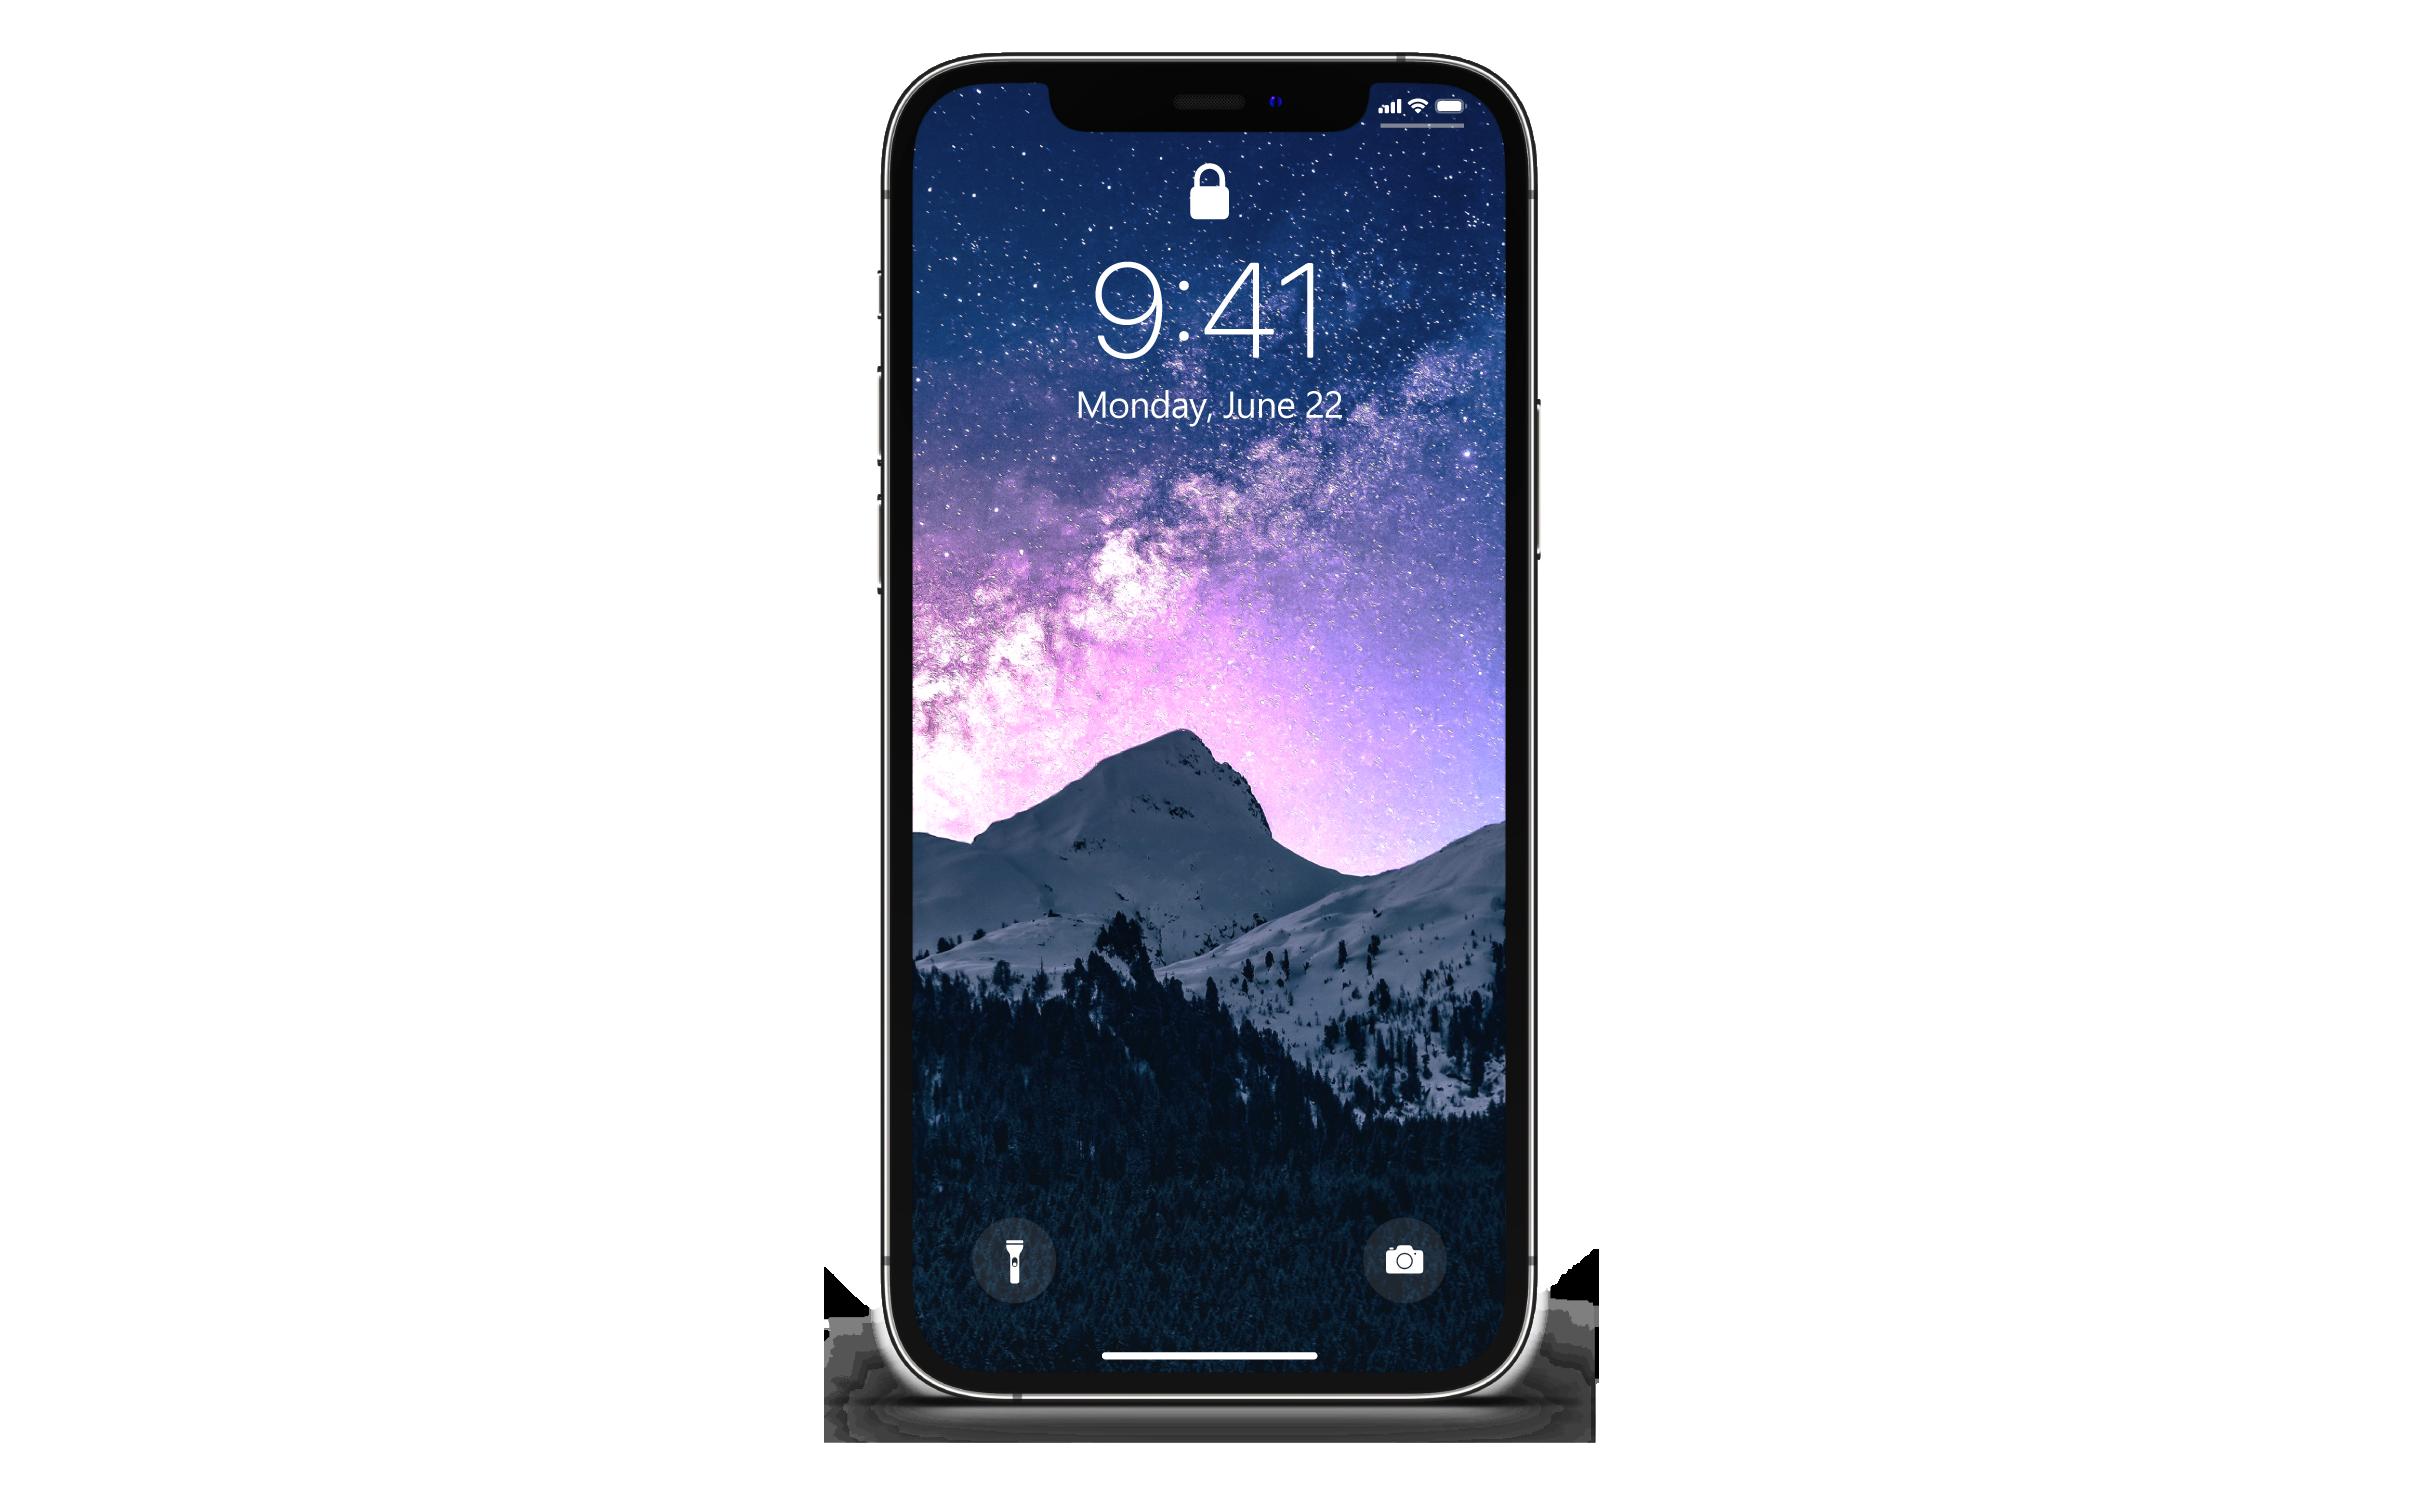 Best 3d live wallpaper app for iPhone